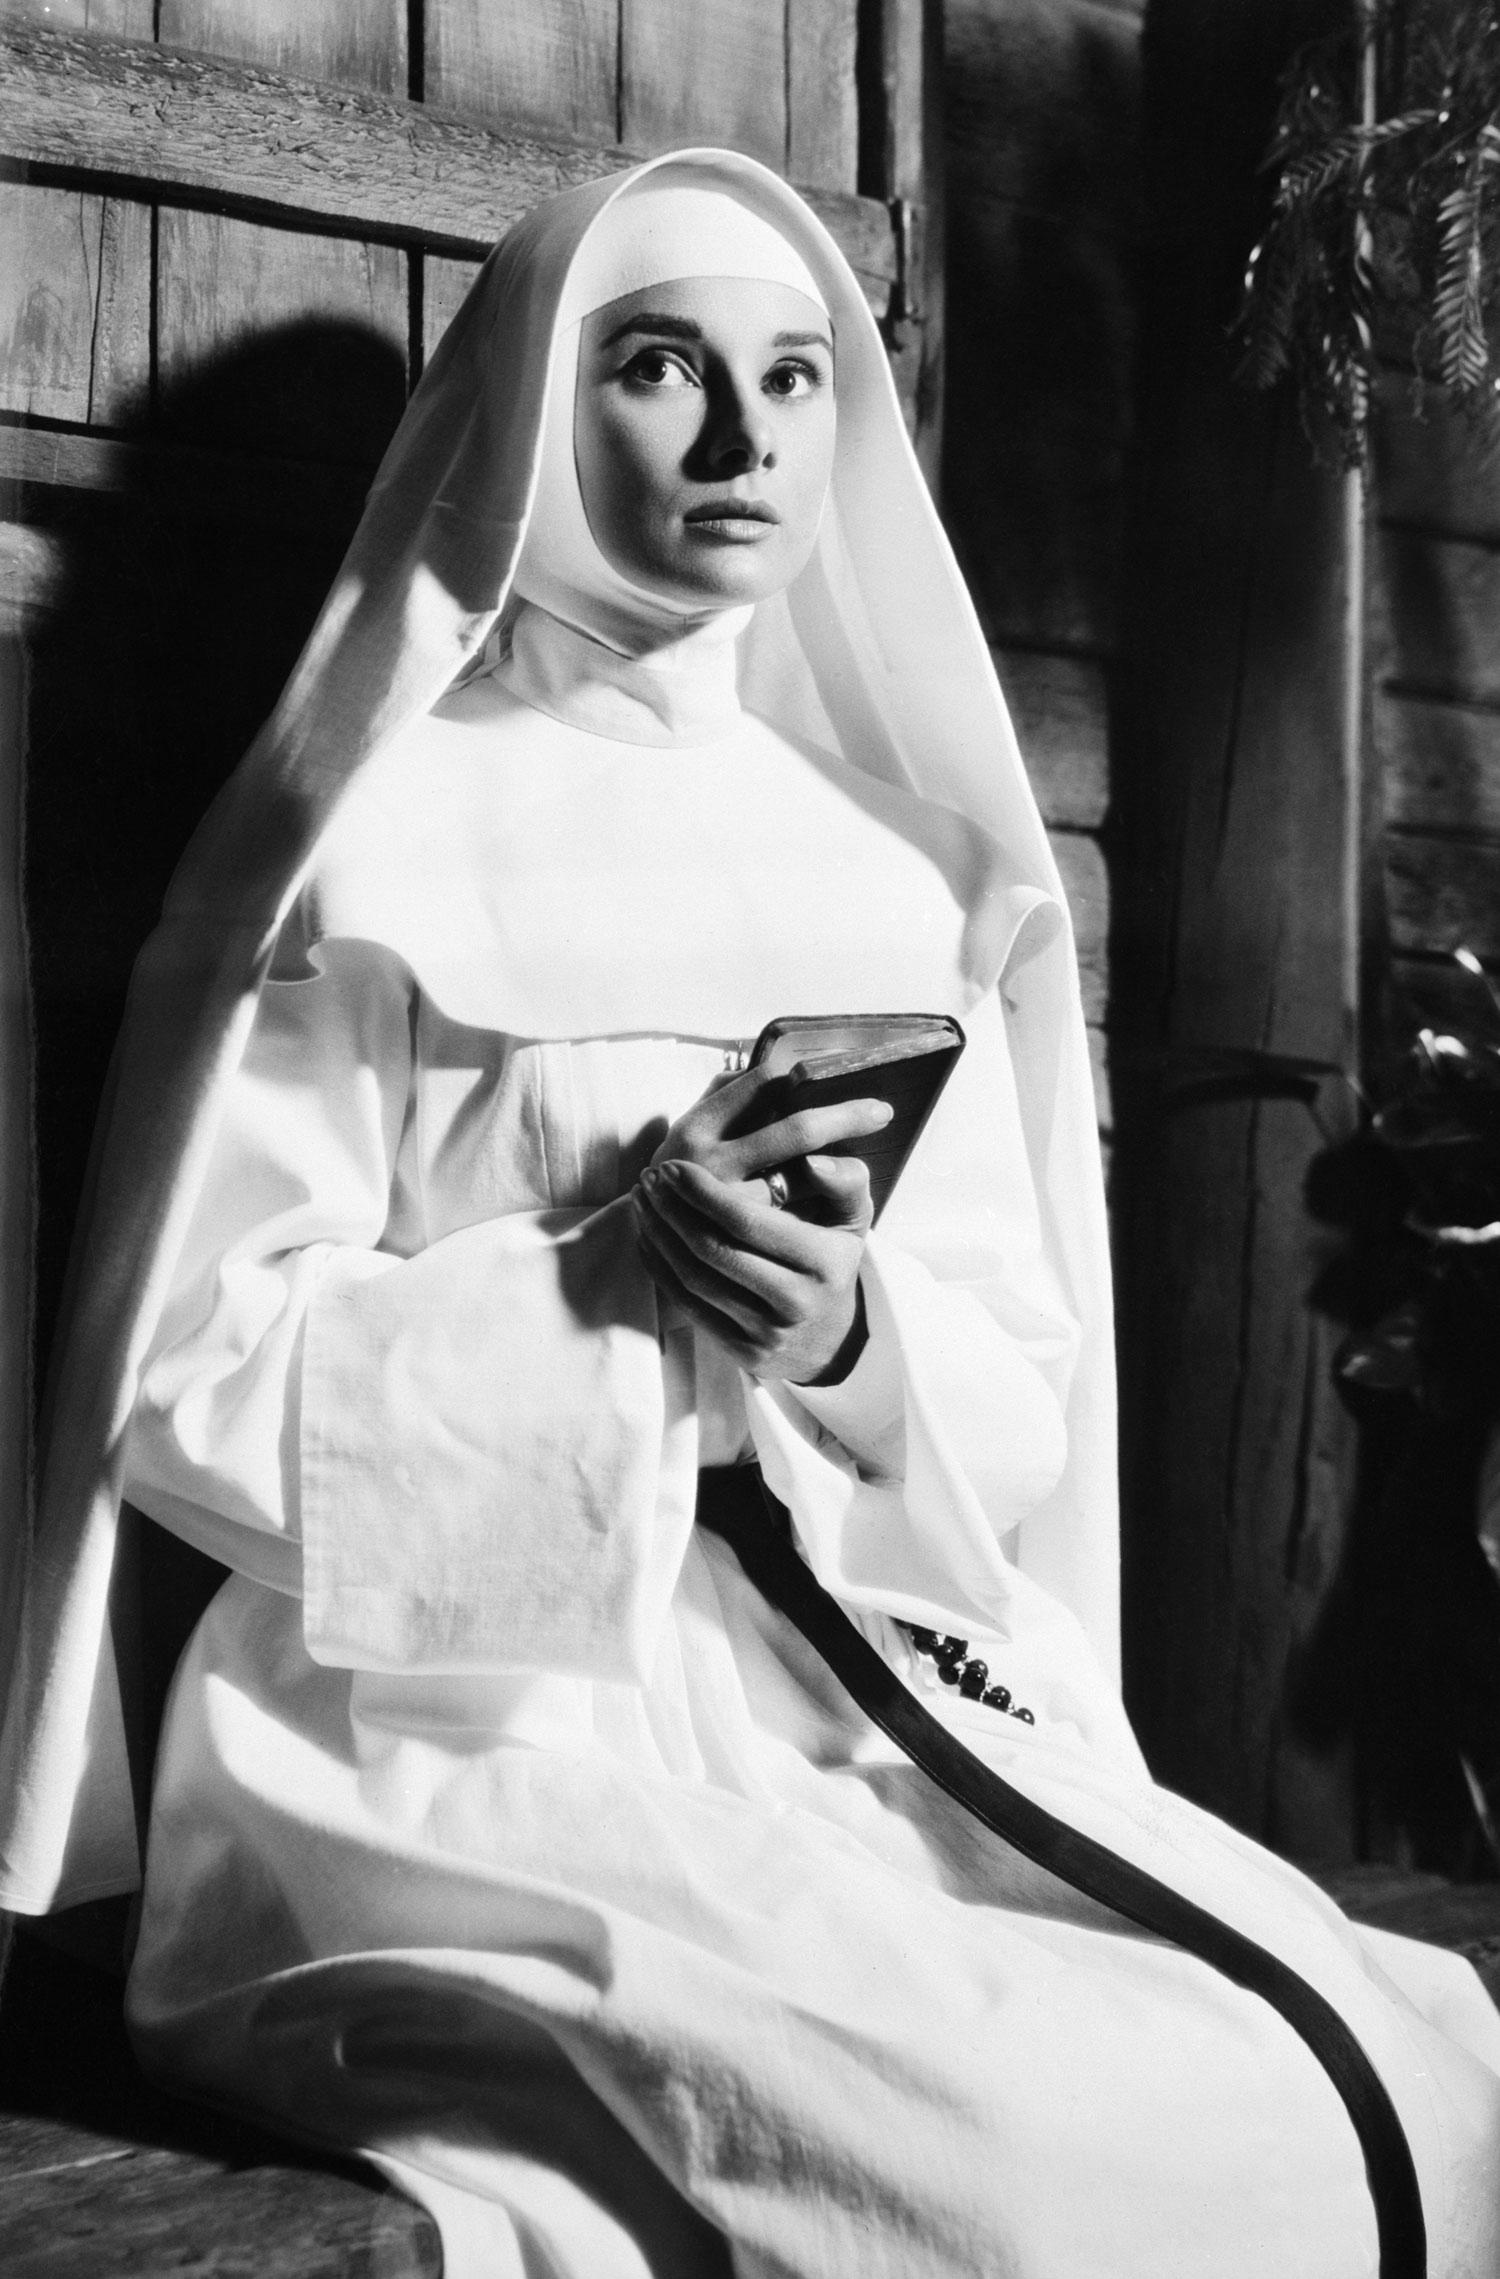 Черно белые фото монахини 12 фотография